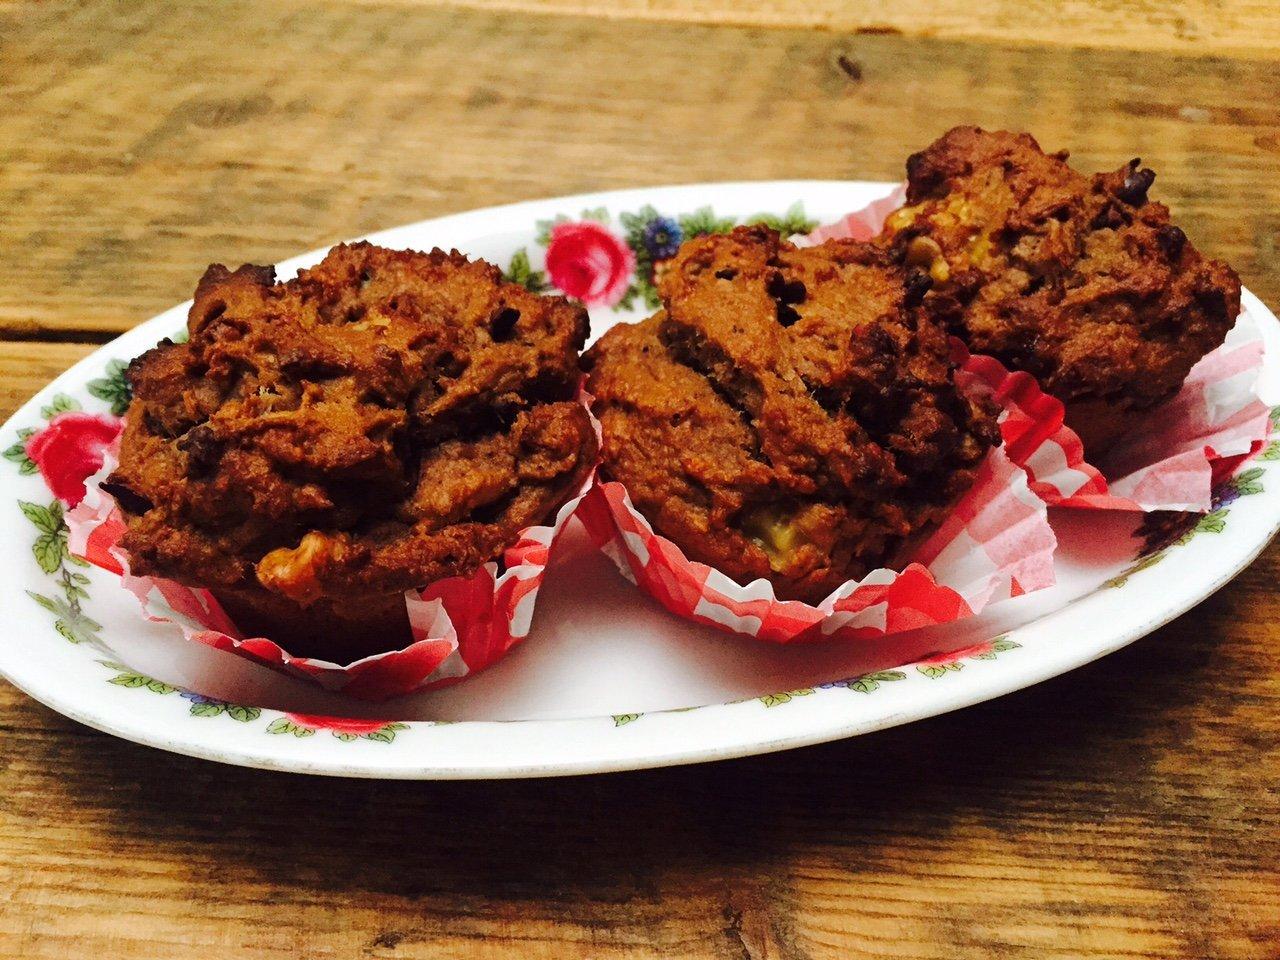 Ontbijtmuffins chocolade pindamuffins recept gezondermaand foodblog Foodinista